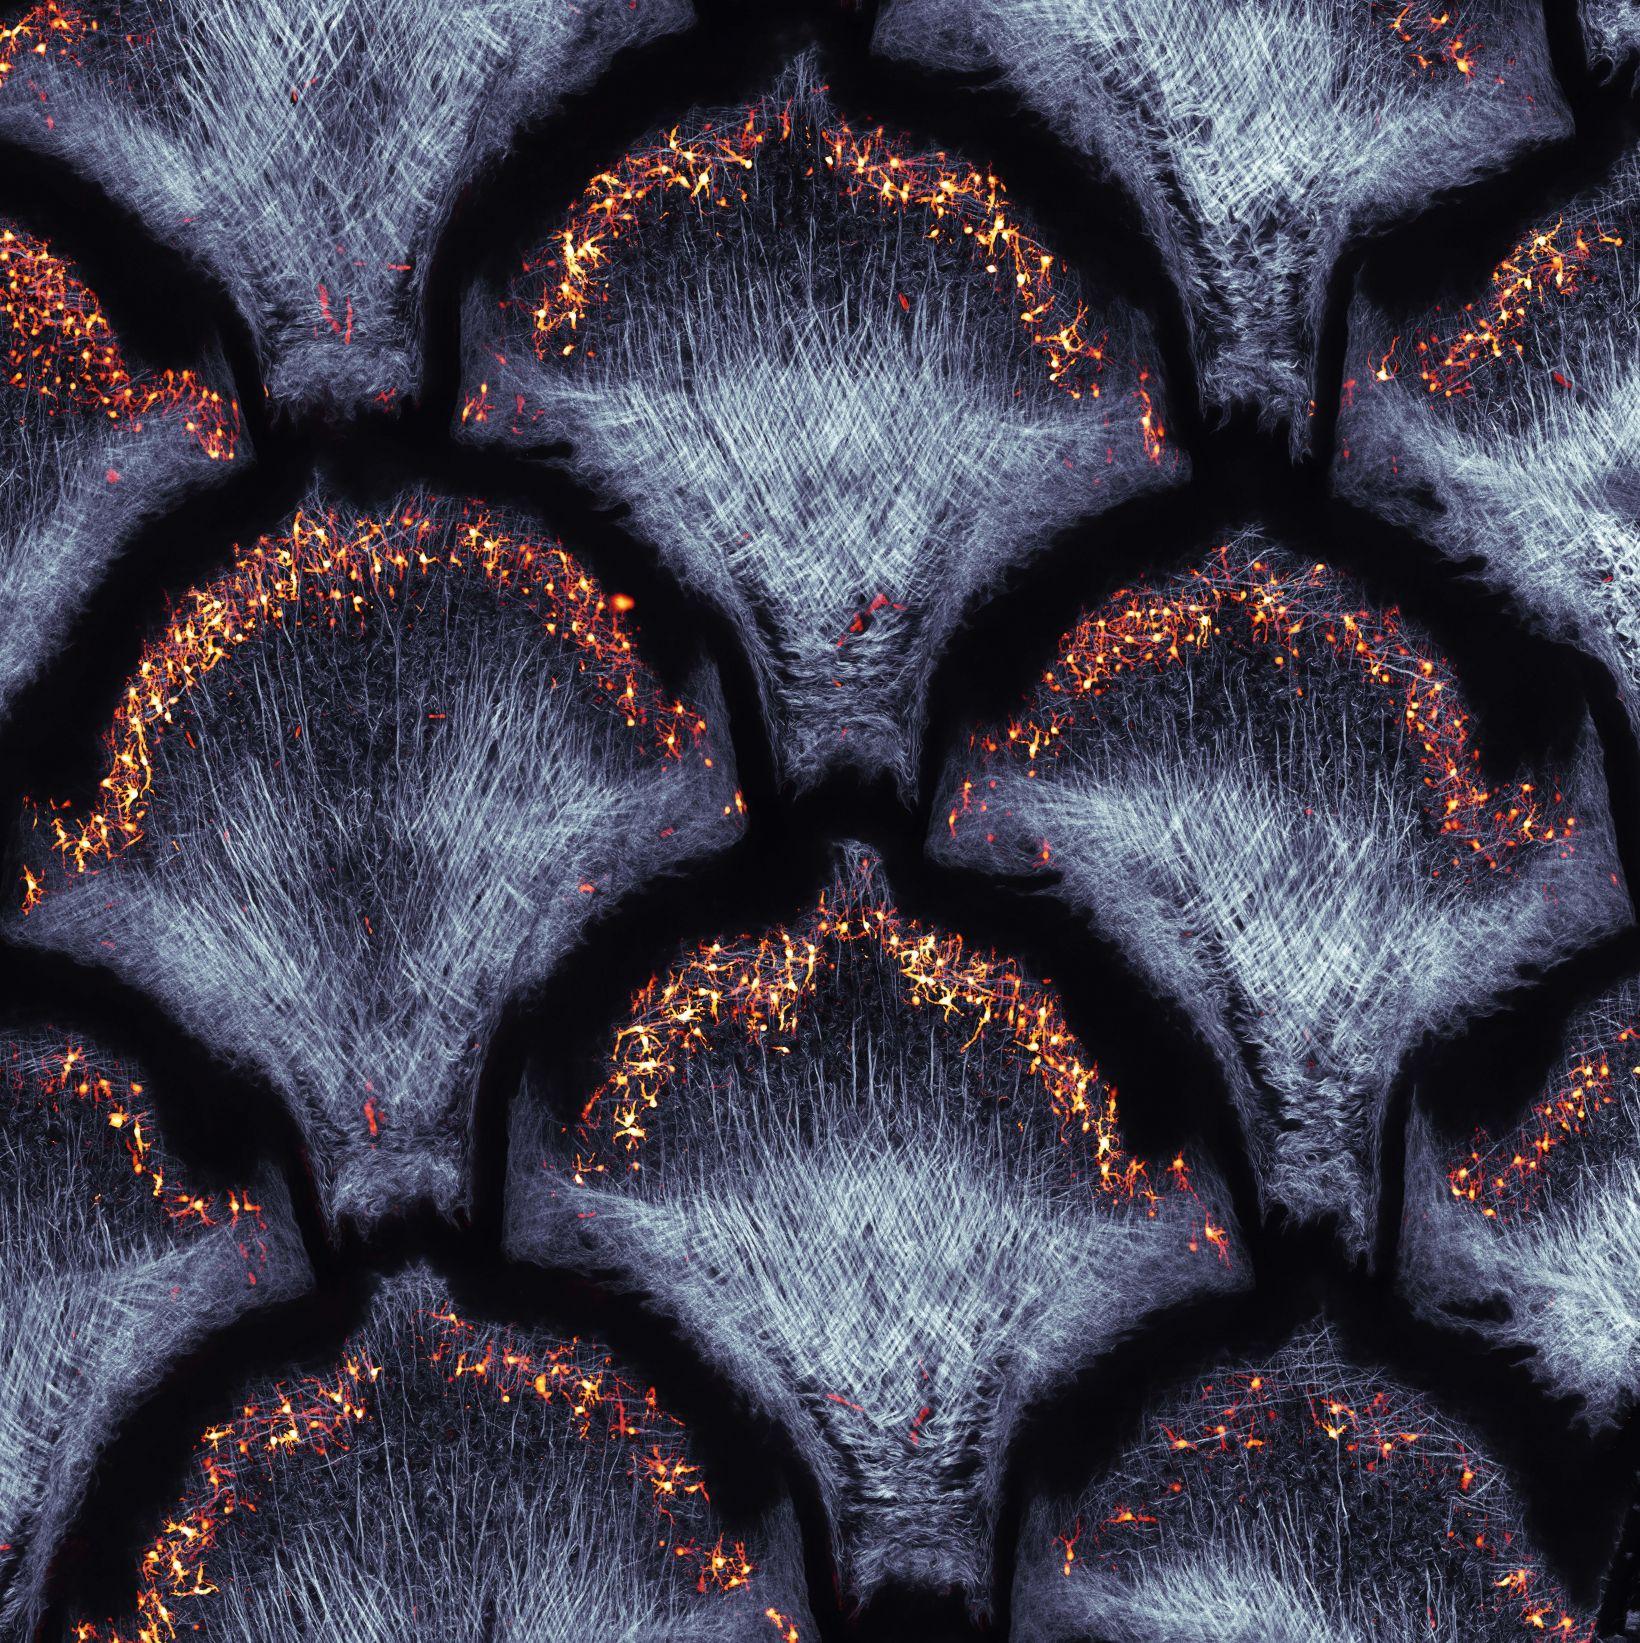 collagen fibers and dermal pigment cells of snakeskin